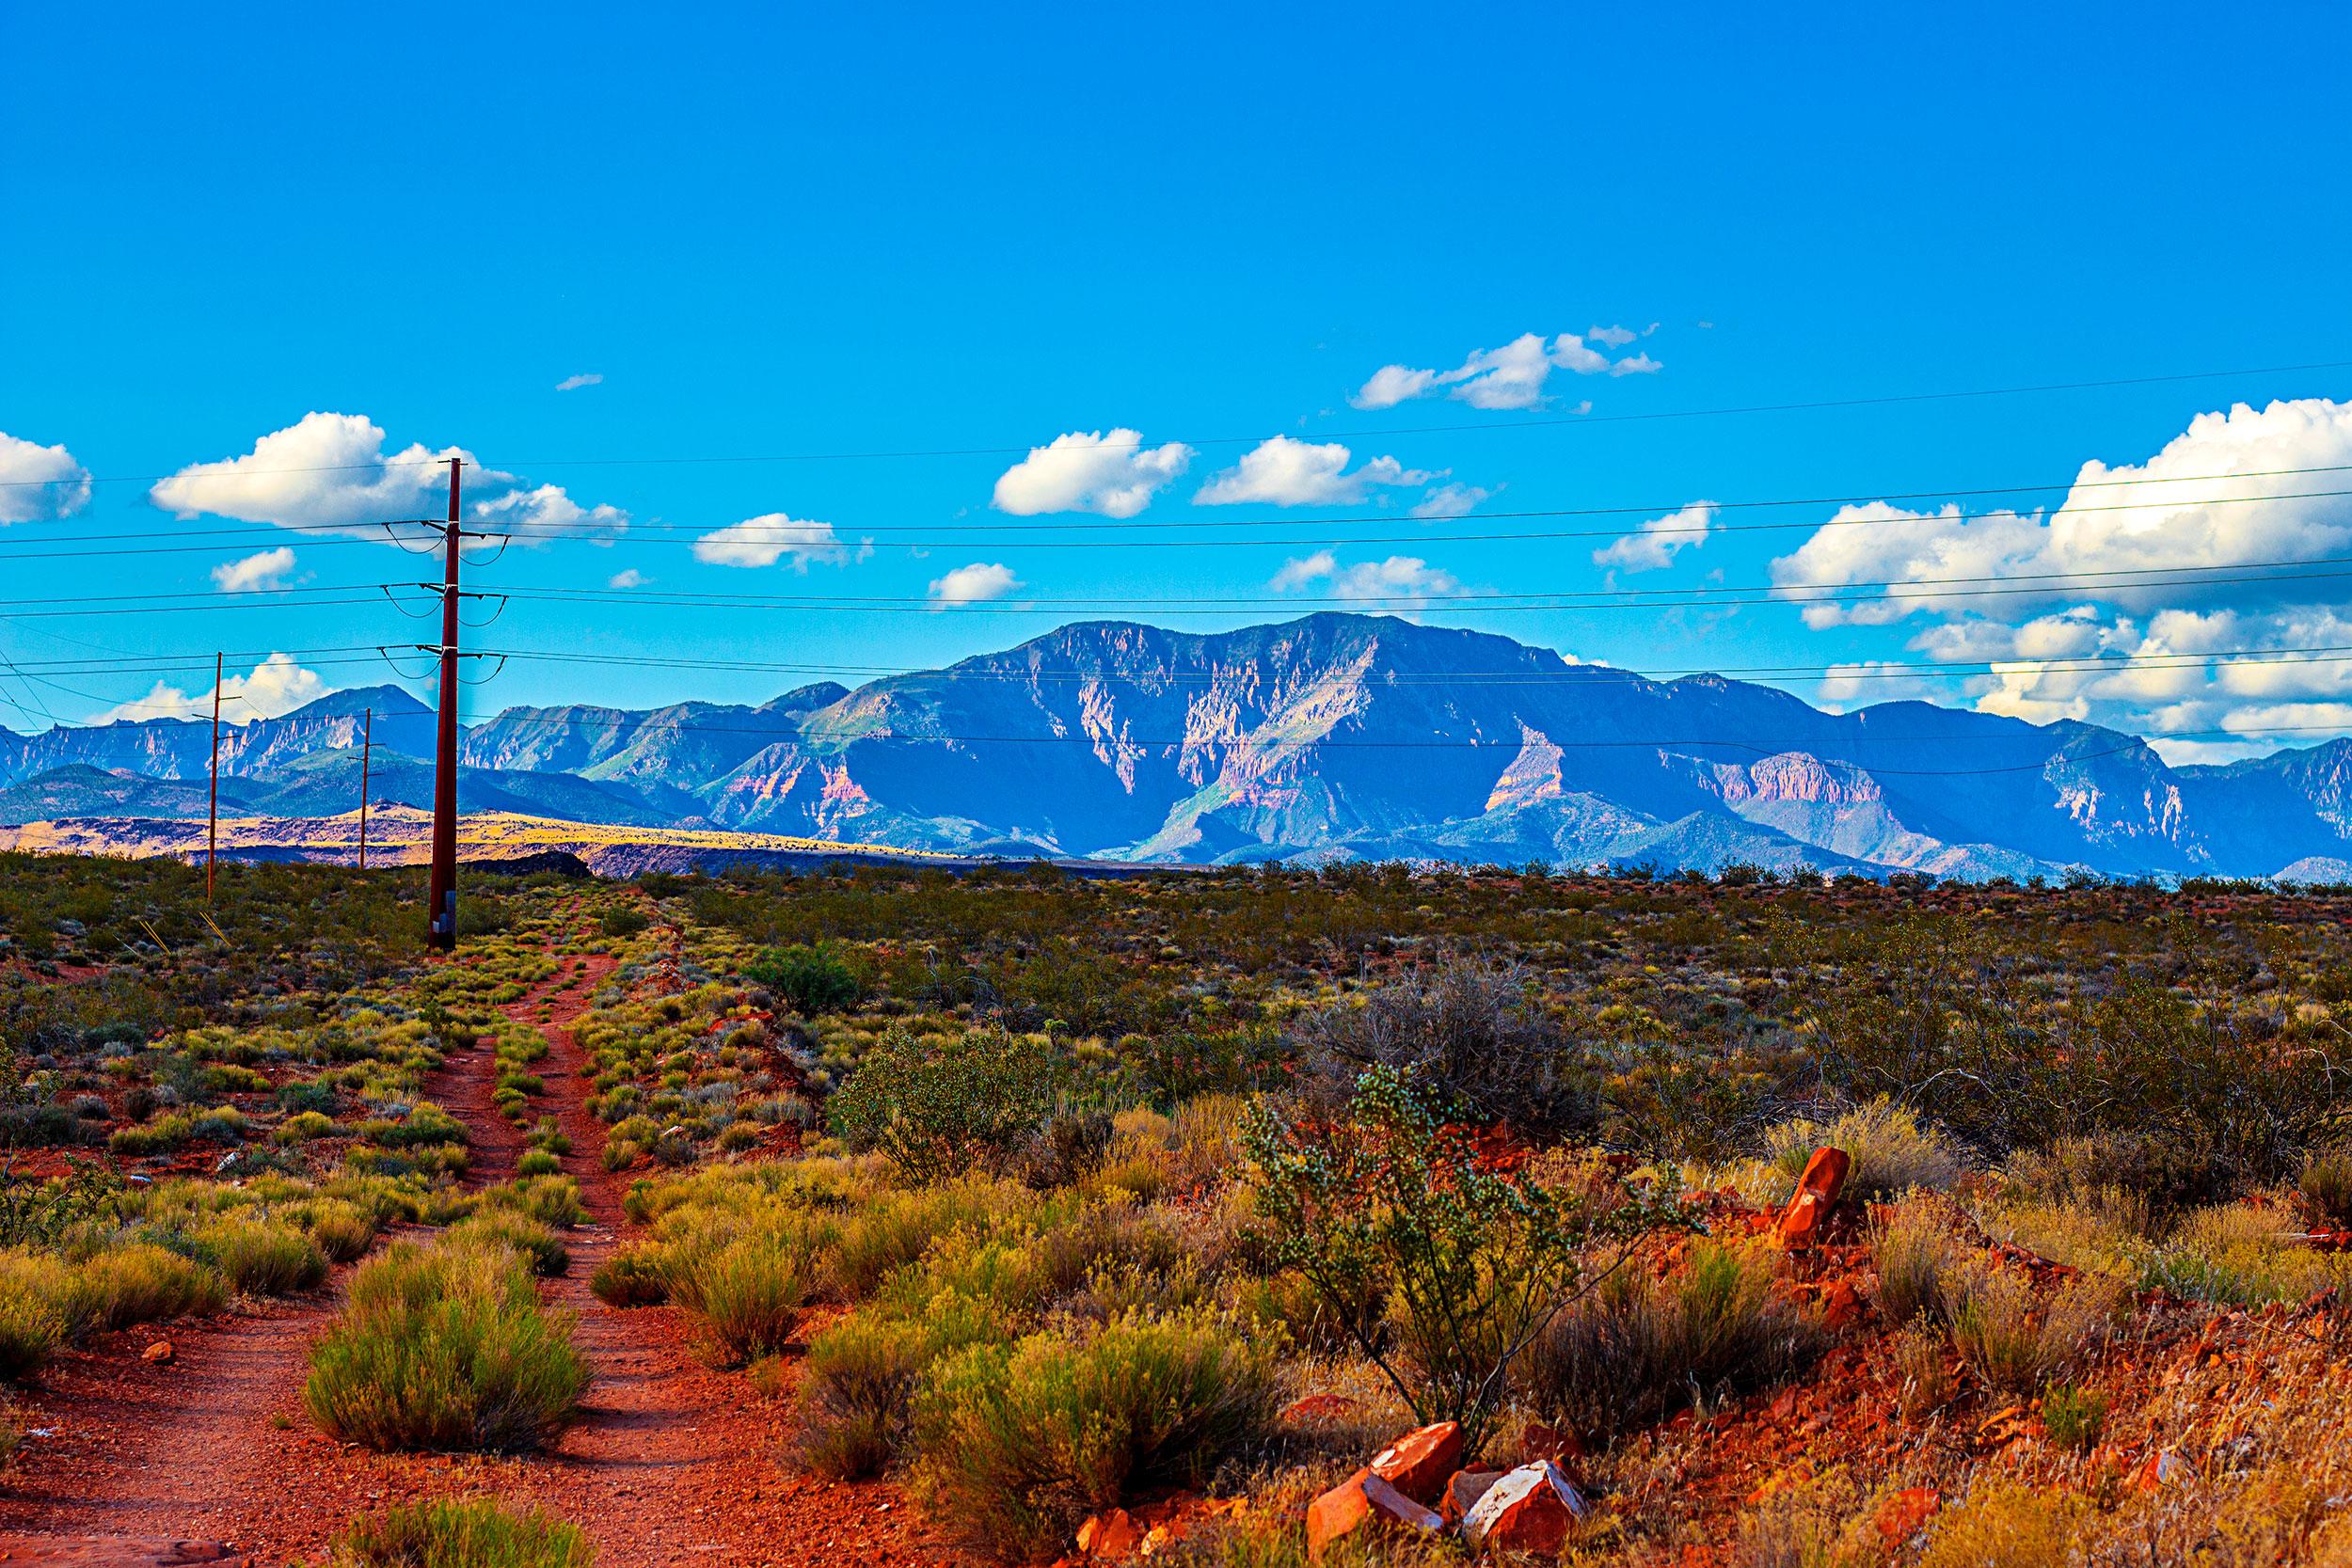 Red-Cliffs-Desert-Reserve.jpg